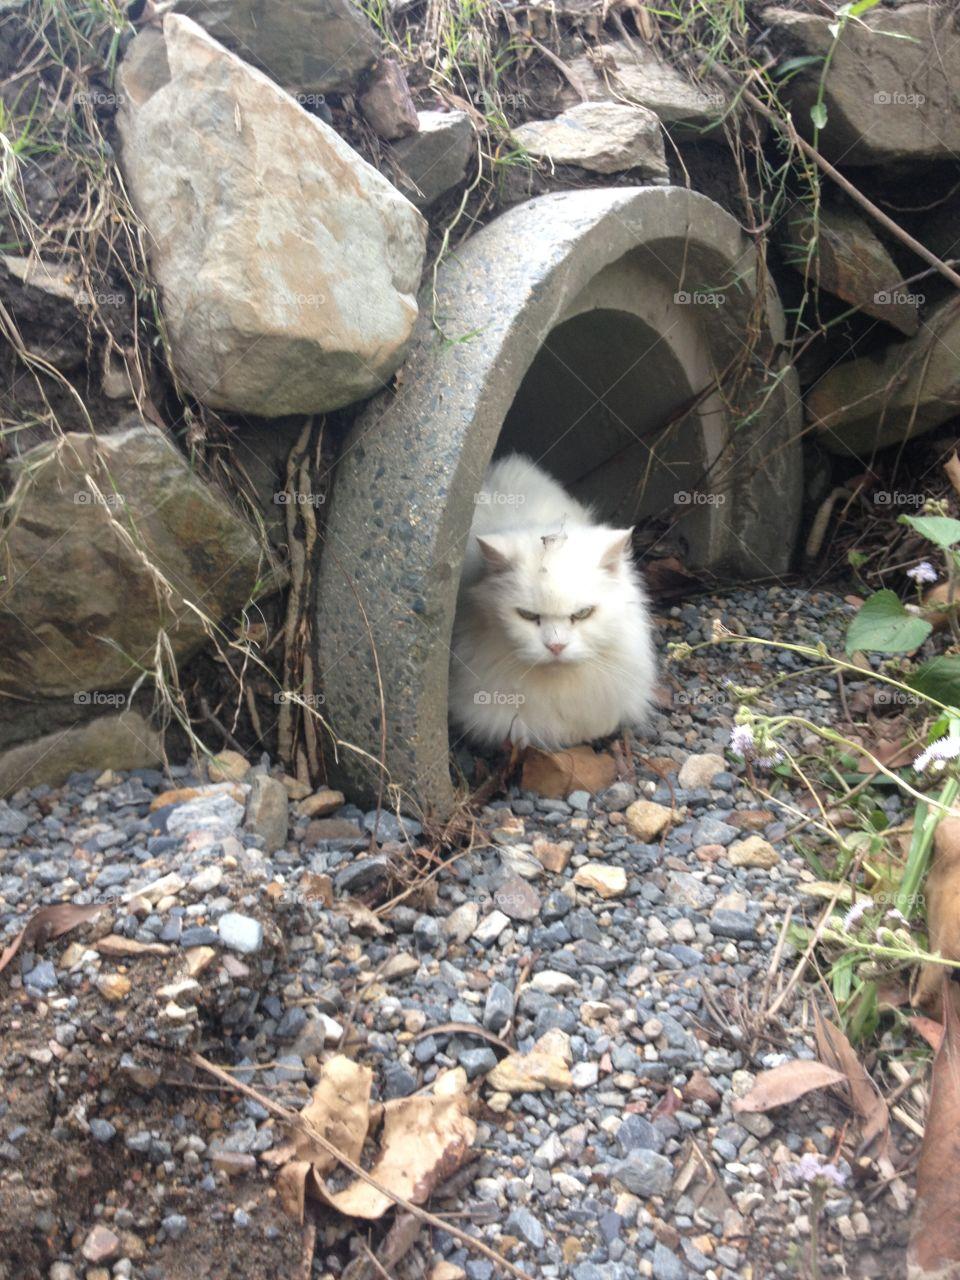 Cat in the drain